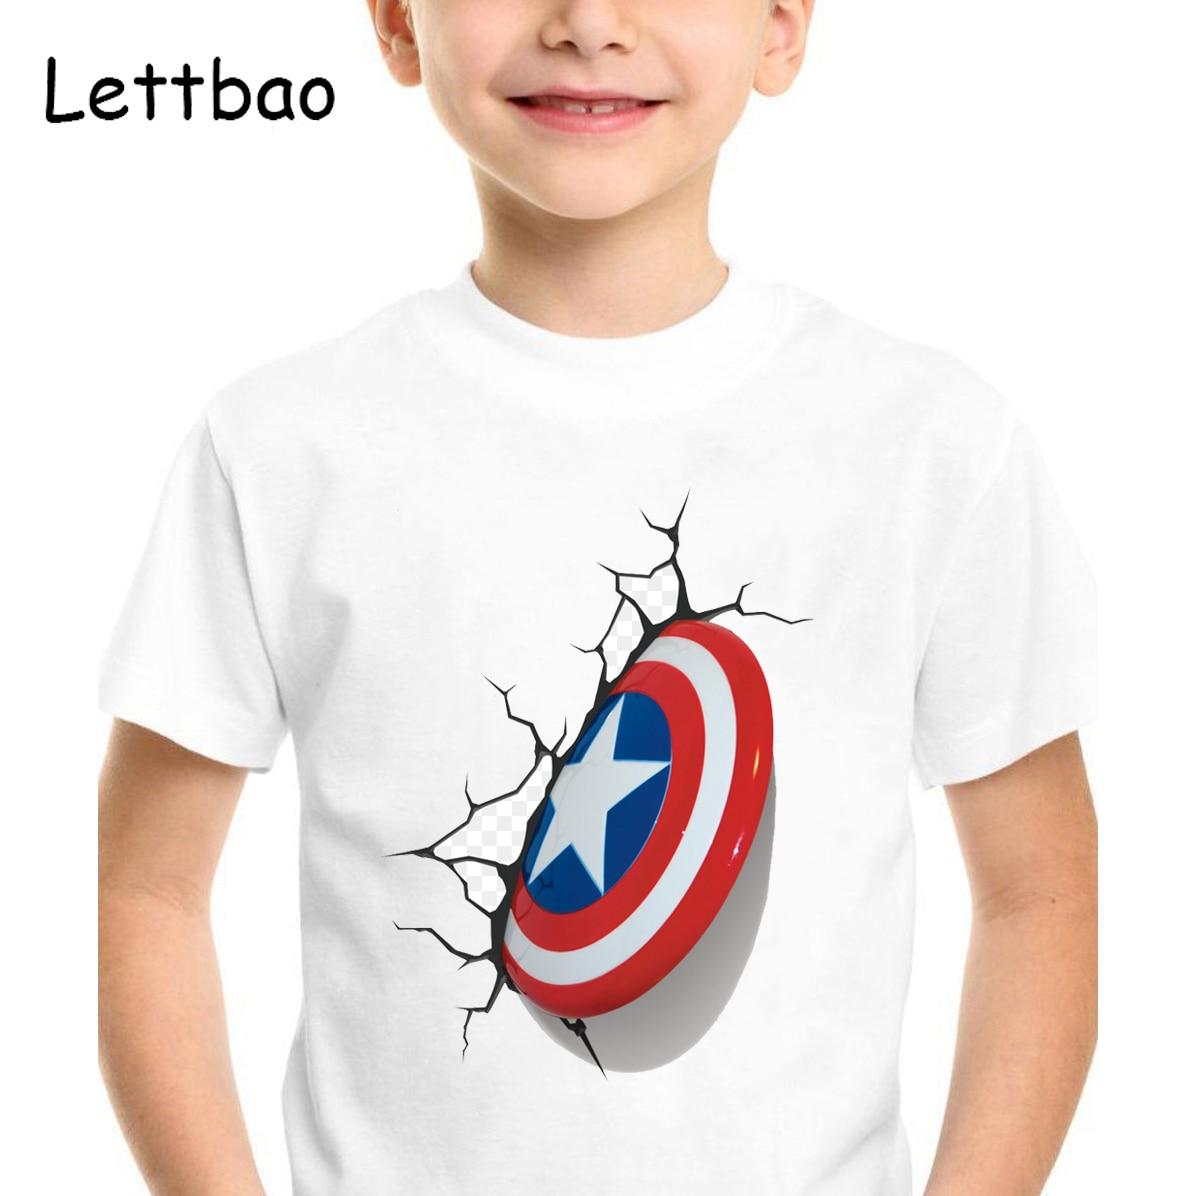 2019 Summer Marvel T-shirt Kids Boy Clothing Avengers Boys T Shirt Clothes Captain America Superhero 3D Printed T Shirt Clothing